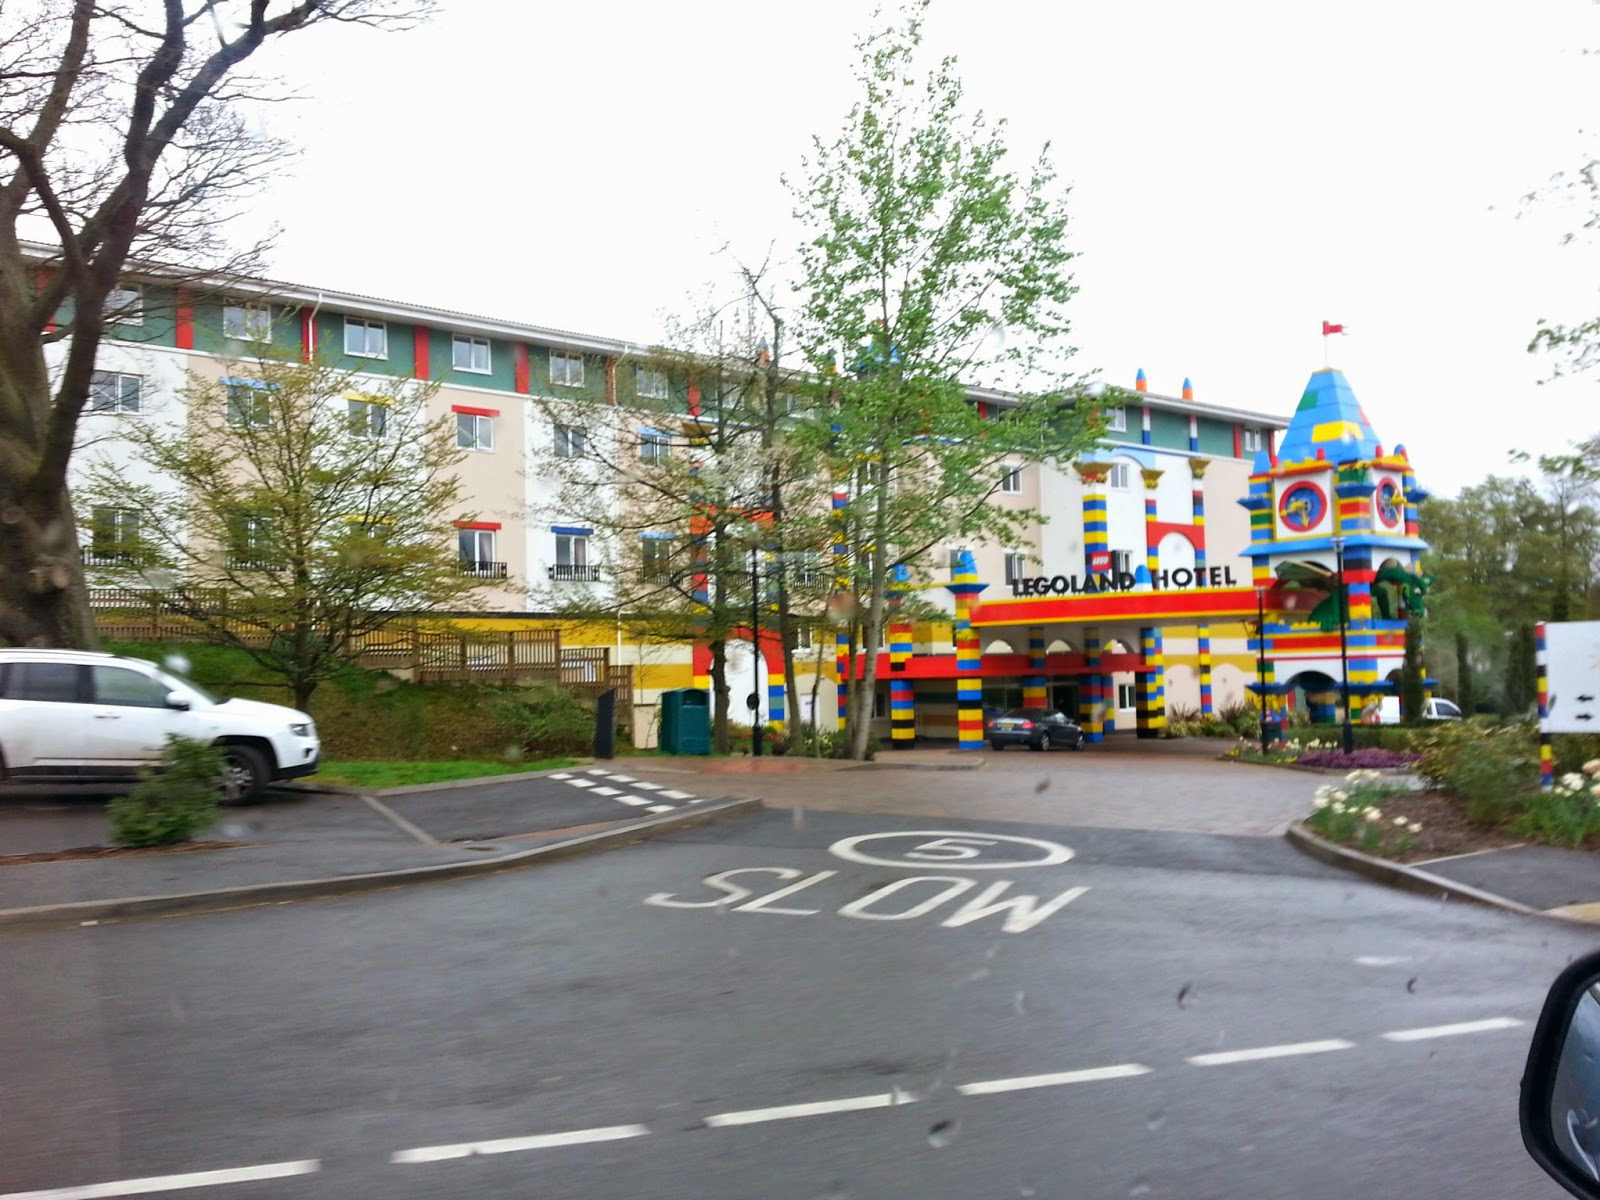 Legoland Windsor 2014, Legoland Windsor Easter, Legoland Windsor Hotel